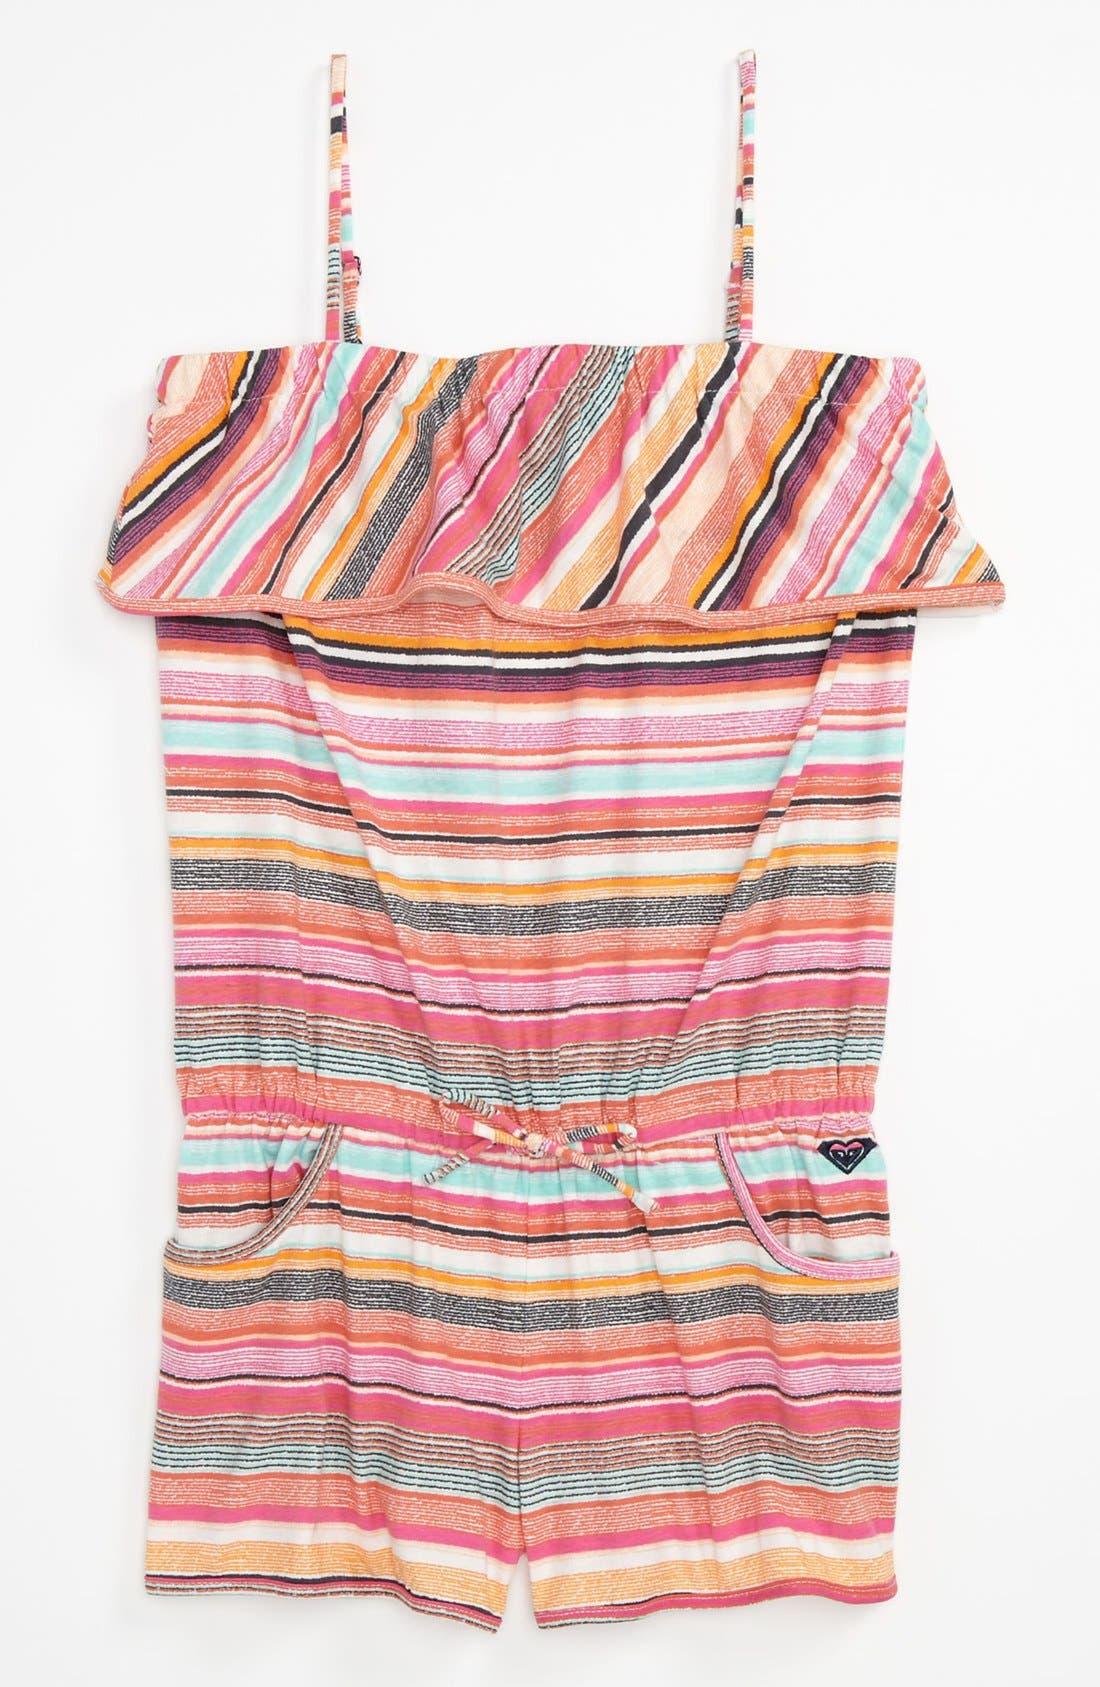 Alternate Image 1 Selected - 'Posies' Knit Romper (Big Girls)